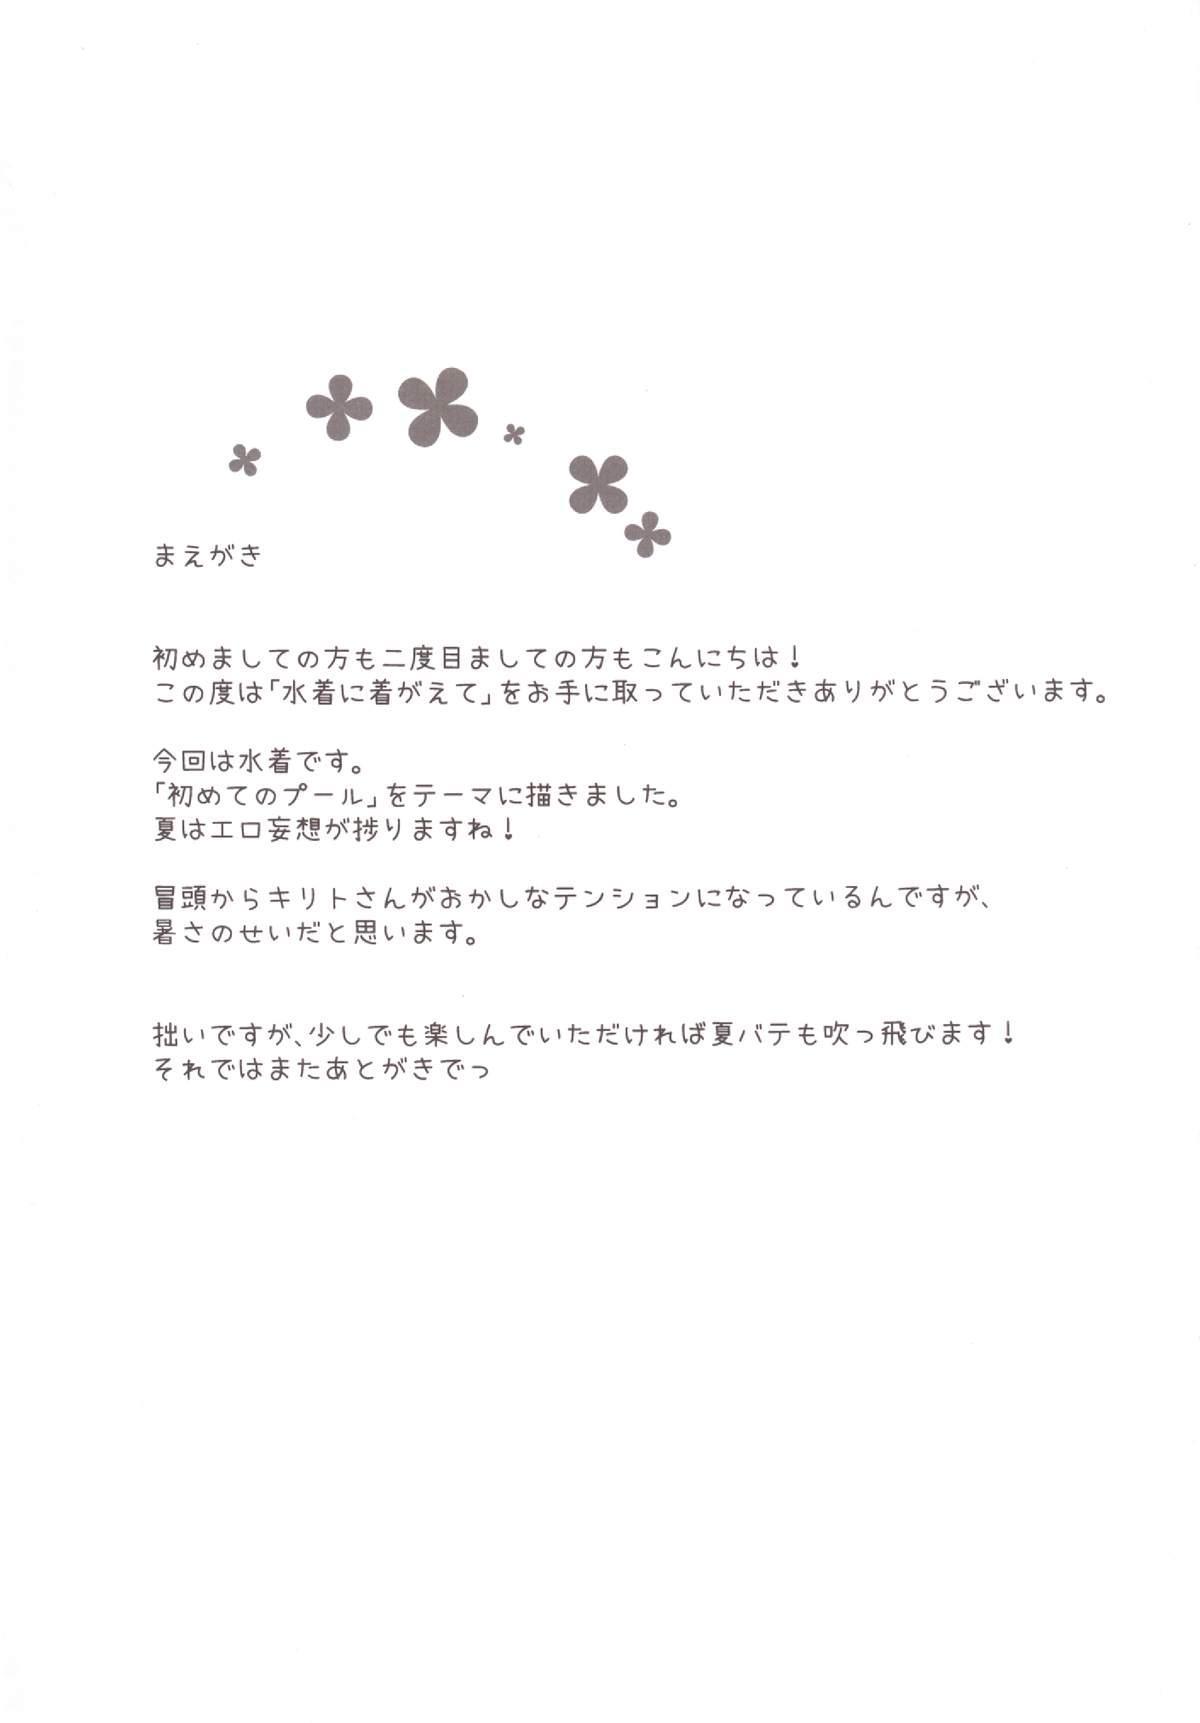 Mizugi ni Kigaete 2